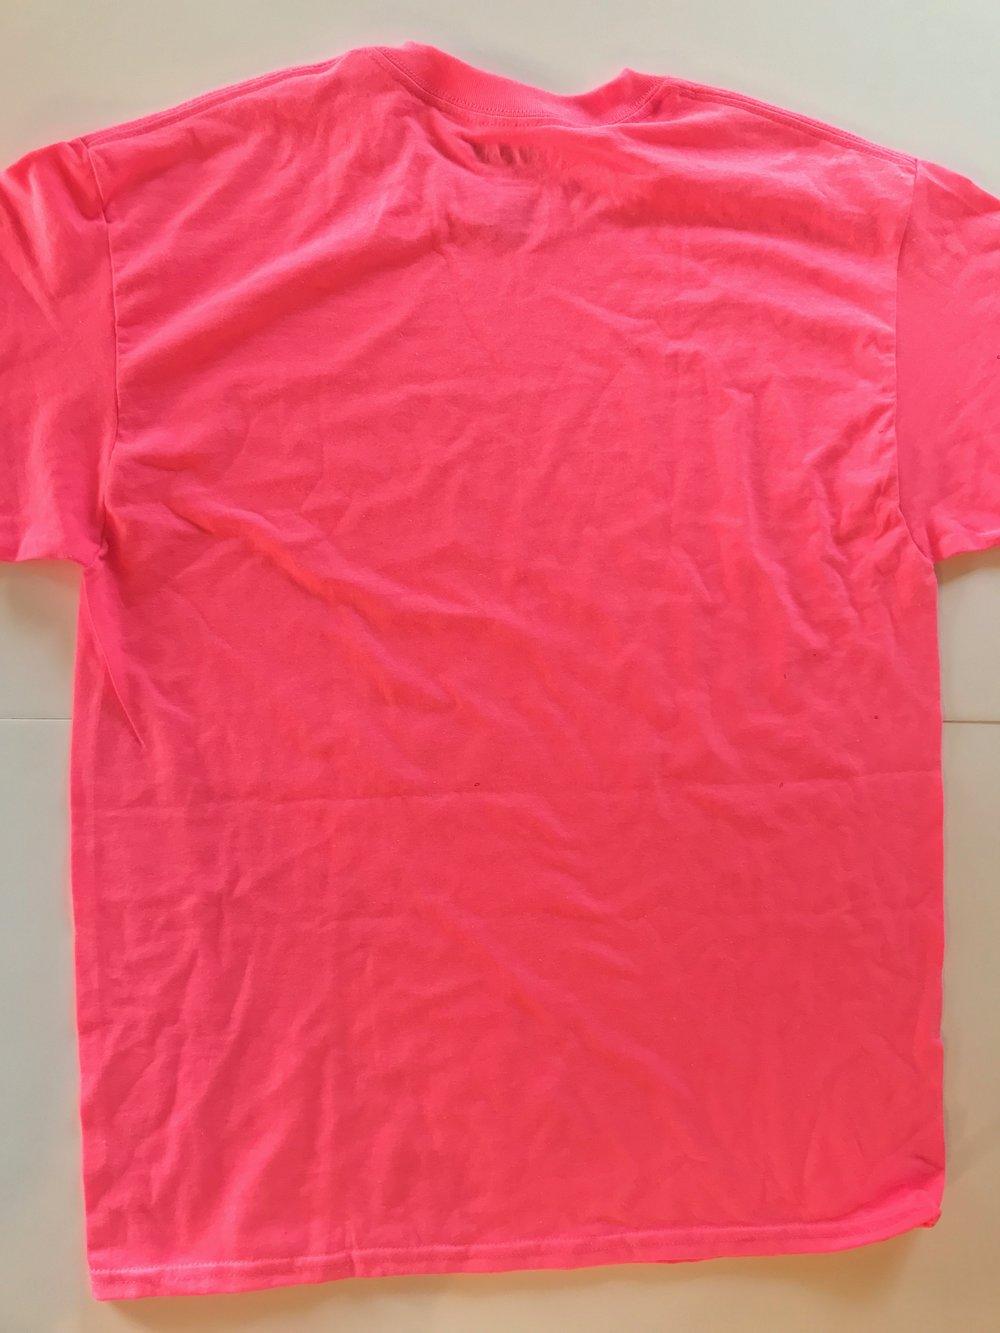 Easy T Shirt Apron Bib or Smock   Peonies and Cream